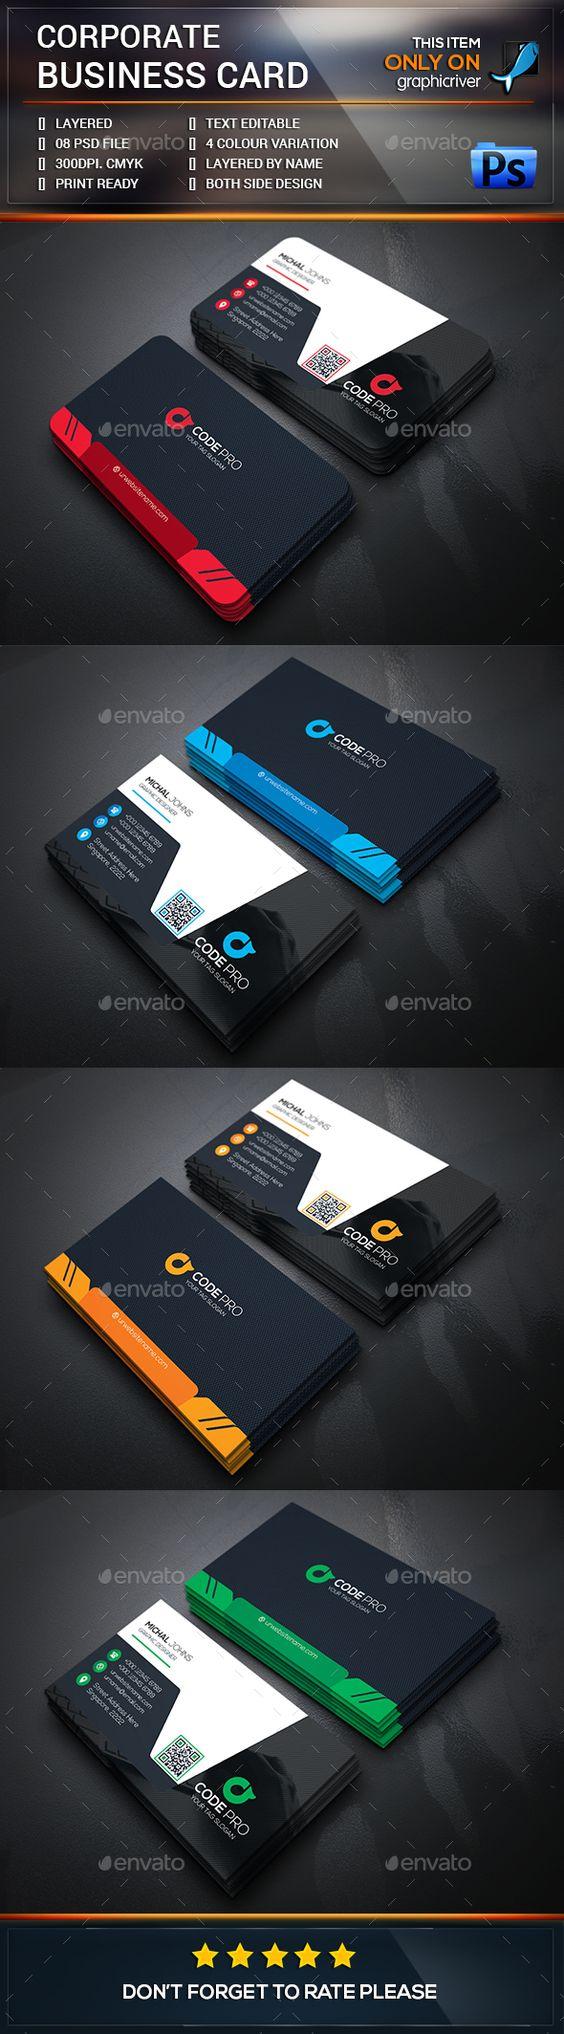 Fantastic Auto Body Shop Business Cards Ideas - Business Card ...